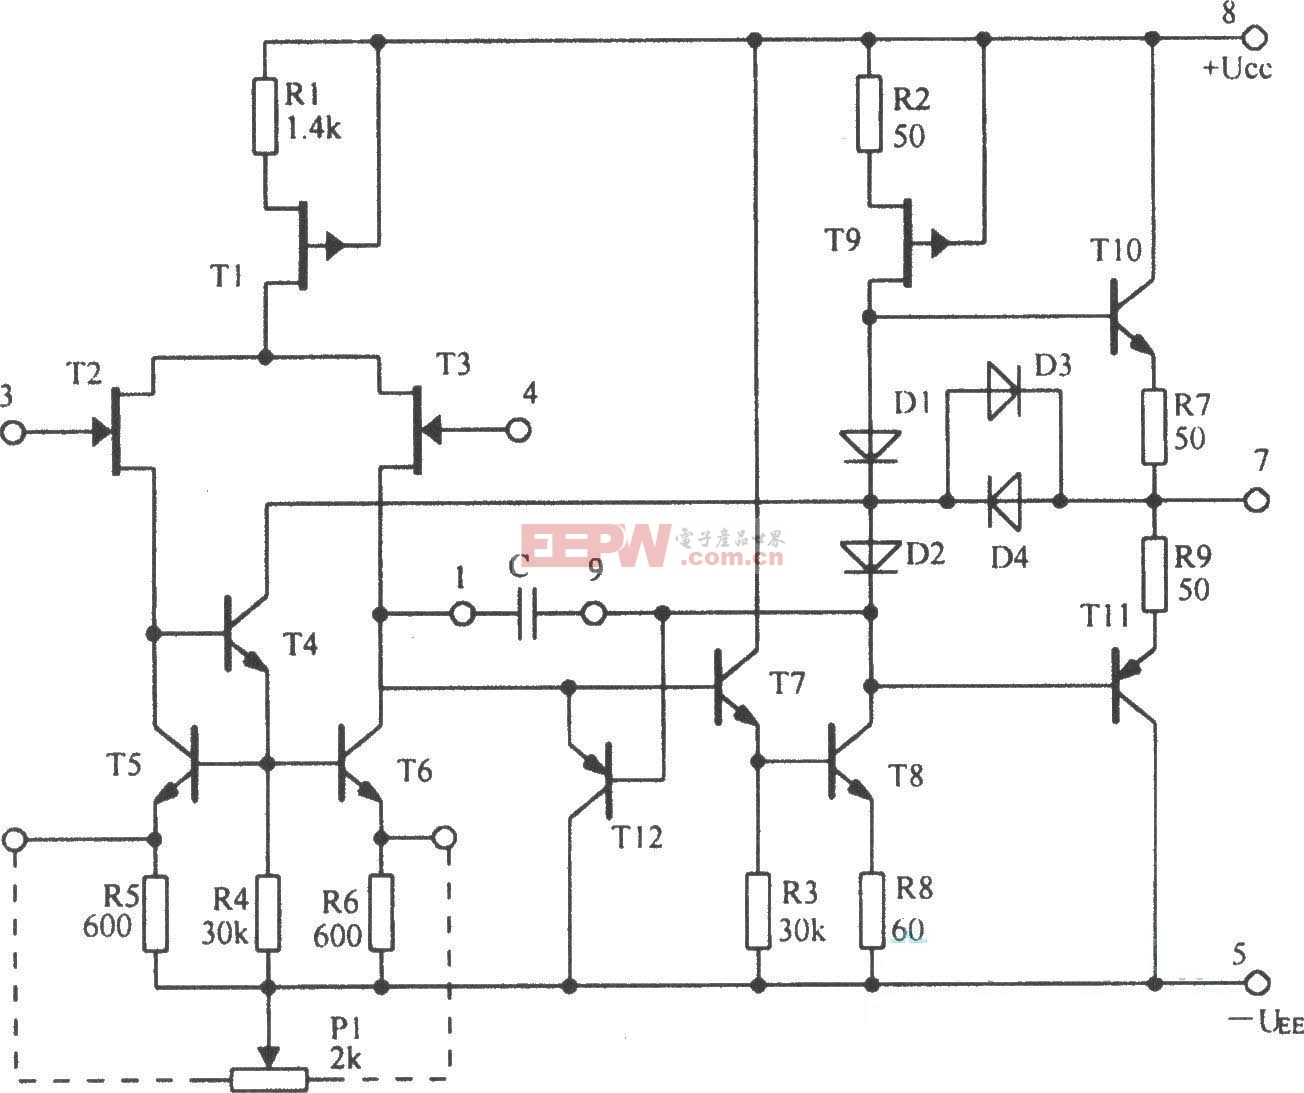 5G28集成运放电路芯片的内部结构框图原理图